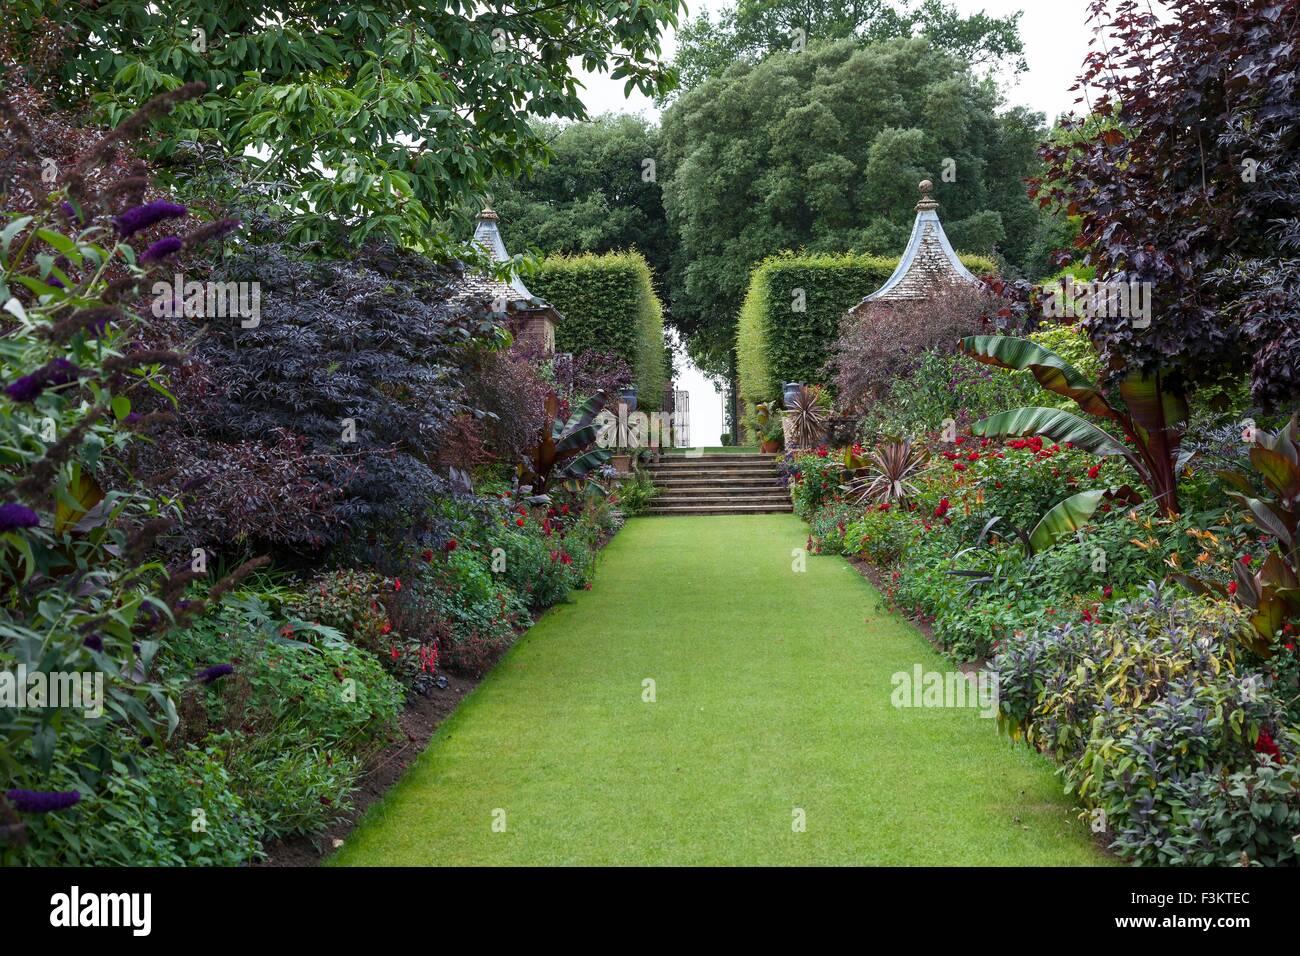 English garden borders with summerhouses. - Stock Image